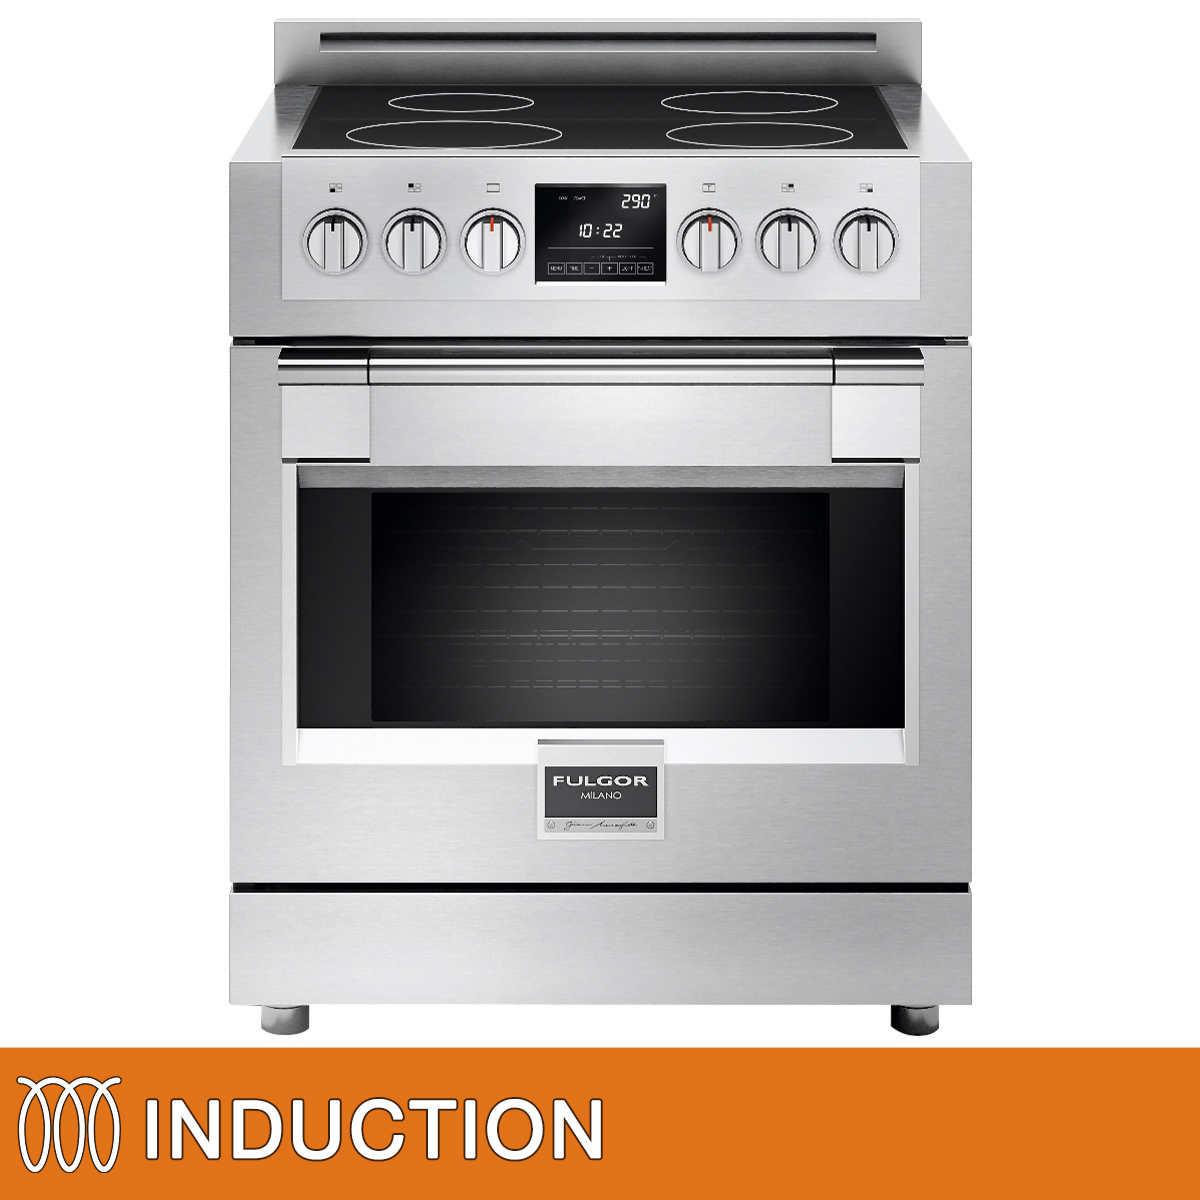 Kitchen small appliances victoria bc - Fulgor Milano Sofia 30 In Induction Range With True Dual Convection